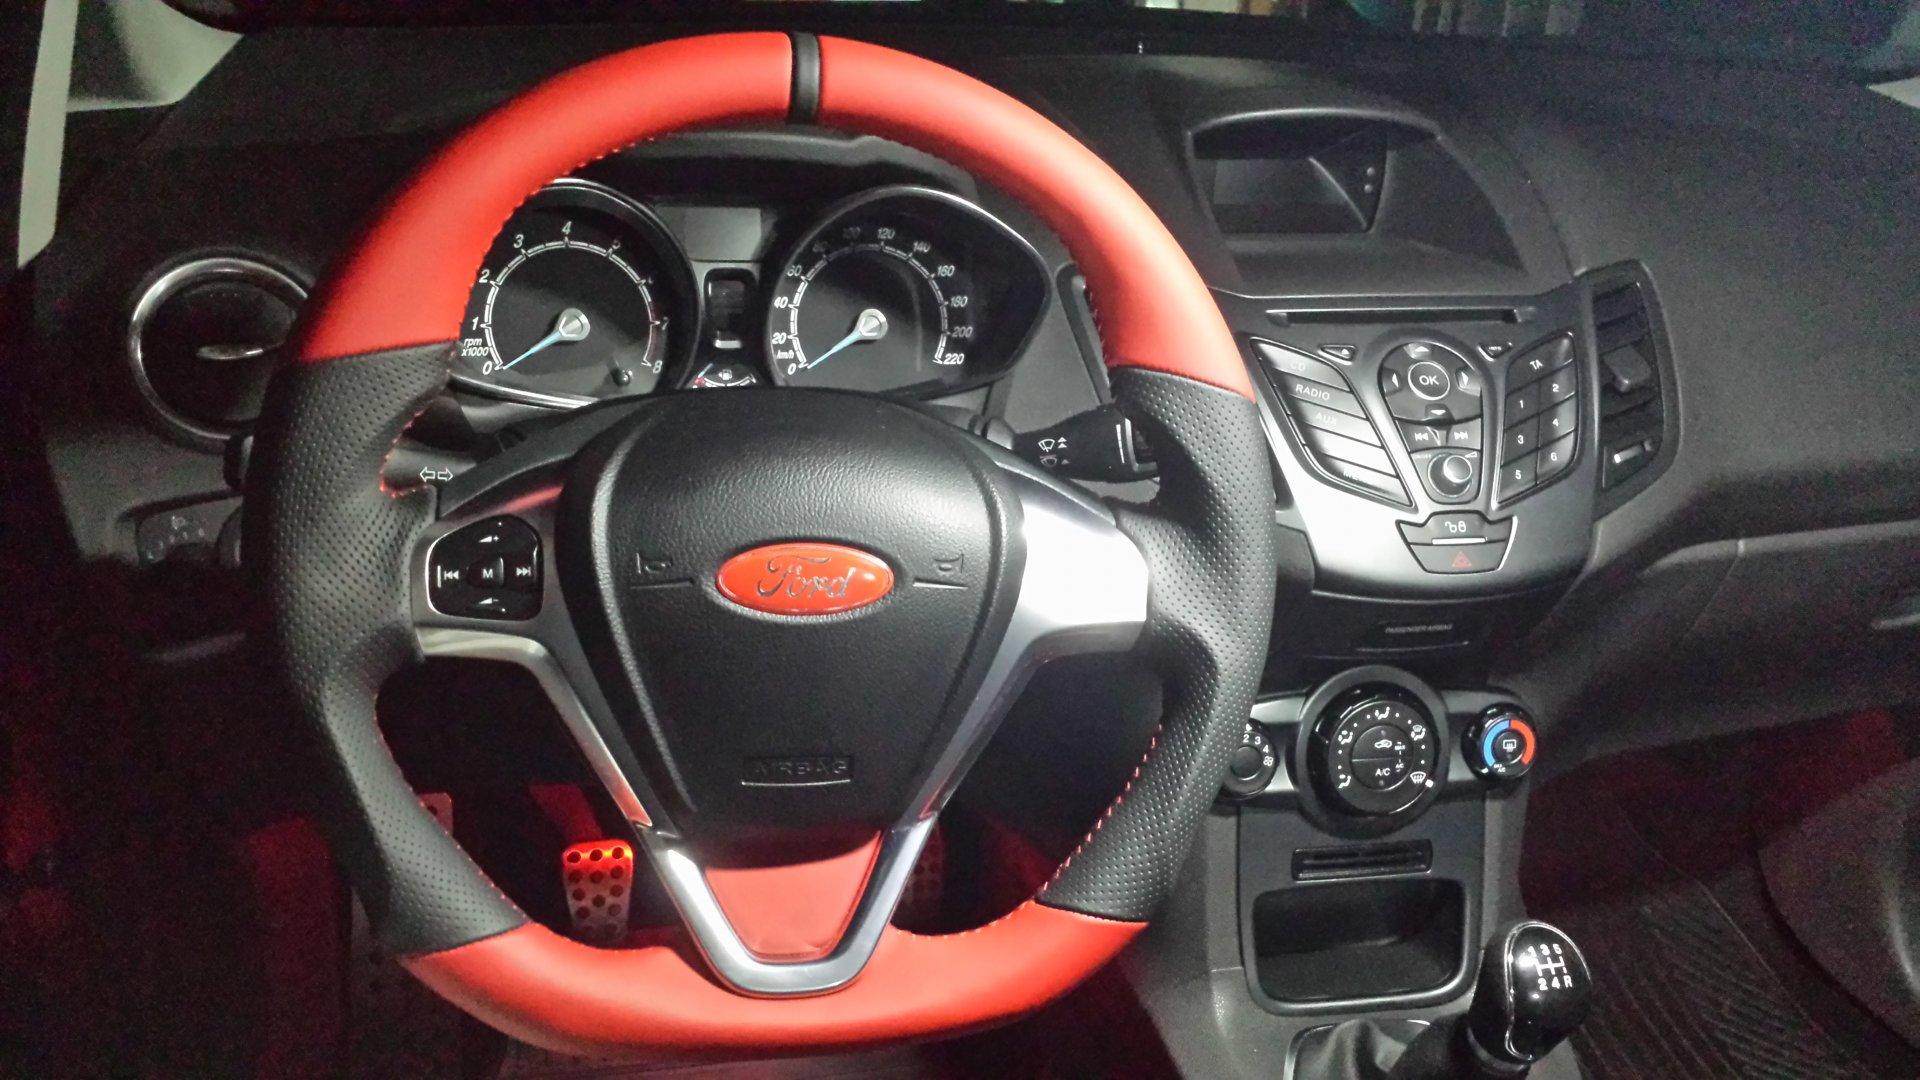 Ford Fiesta VII (2018-05-08) - Lederlenkrad u. Ford-Emblem Gel Badge rot.jpg